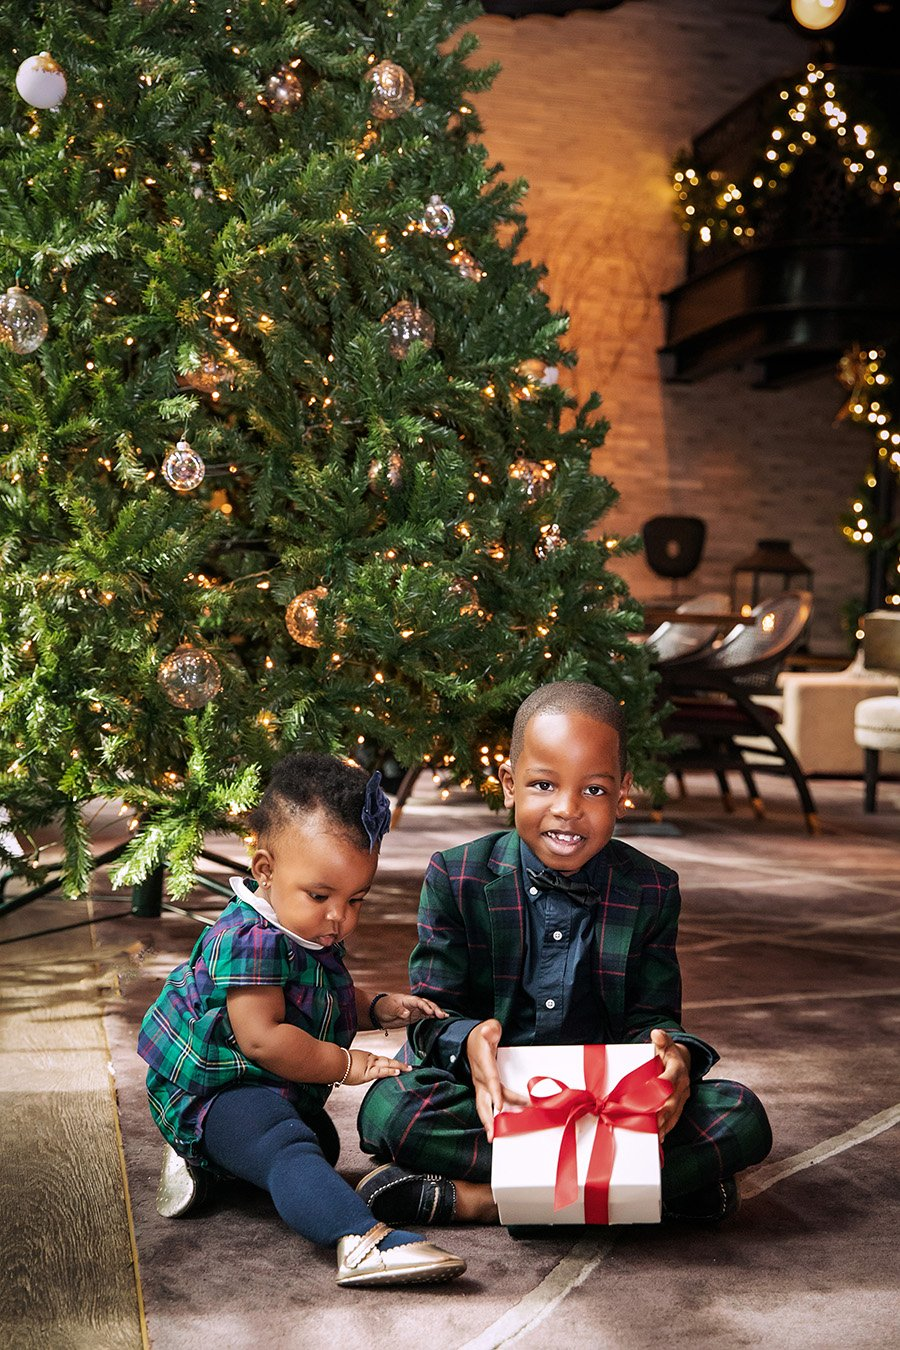 Stella-Adewunmi shares Last minute gift ideas